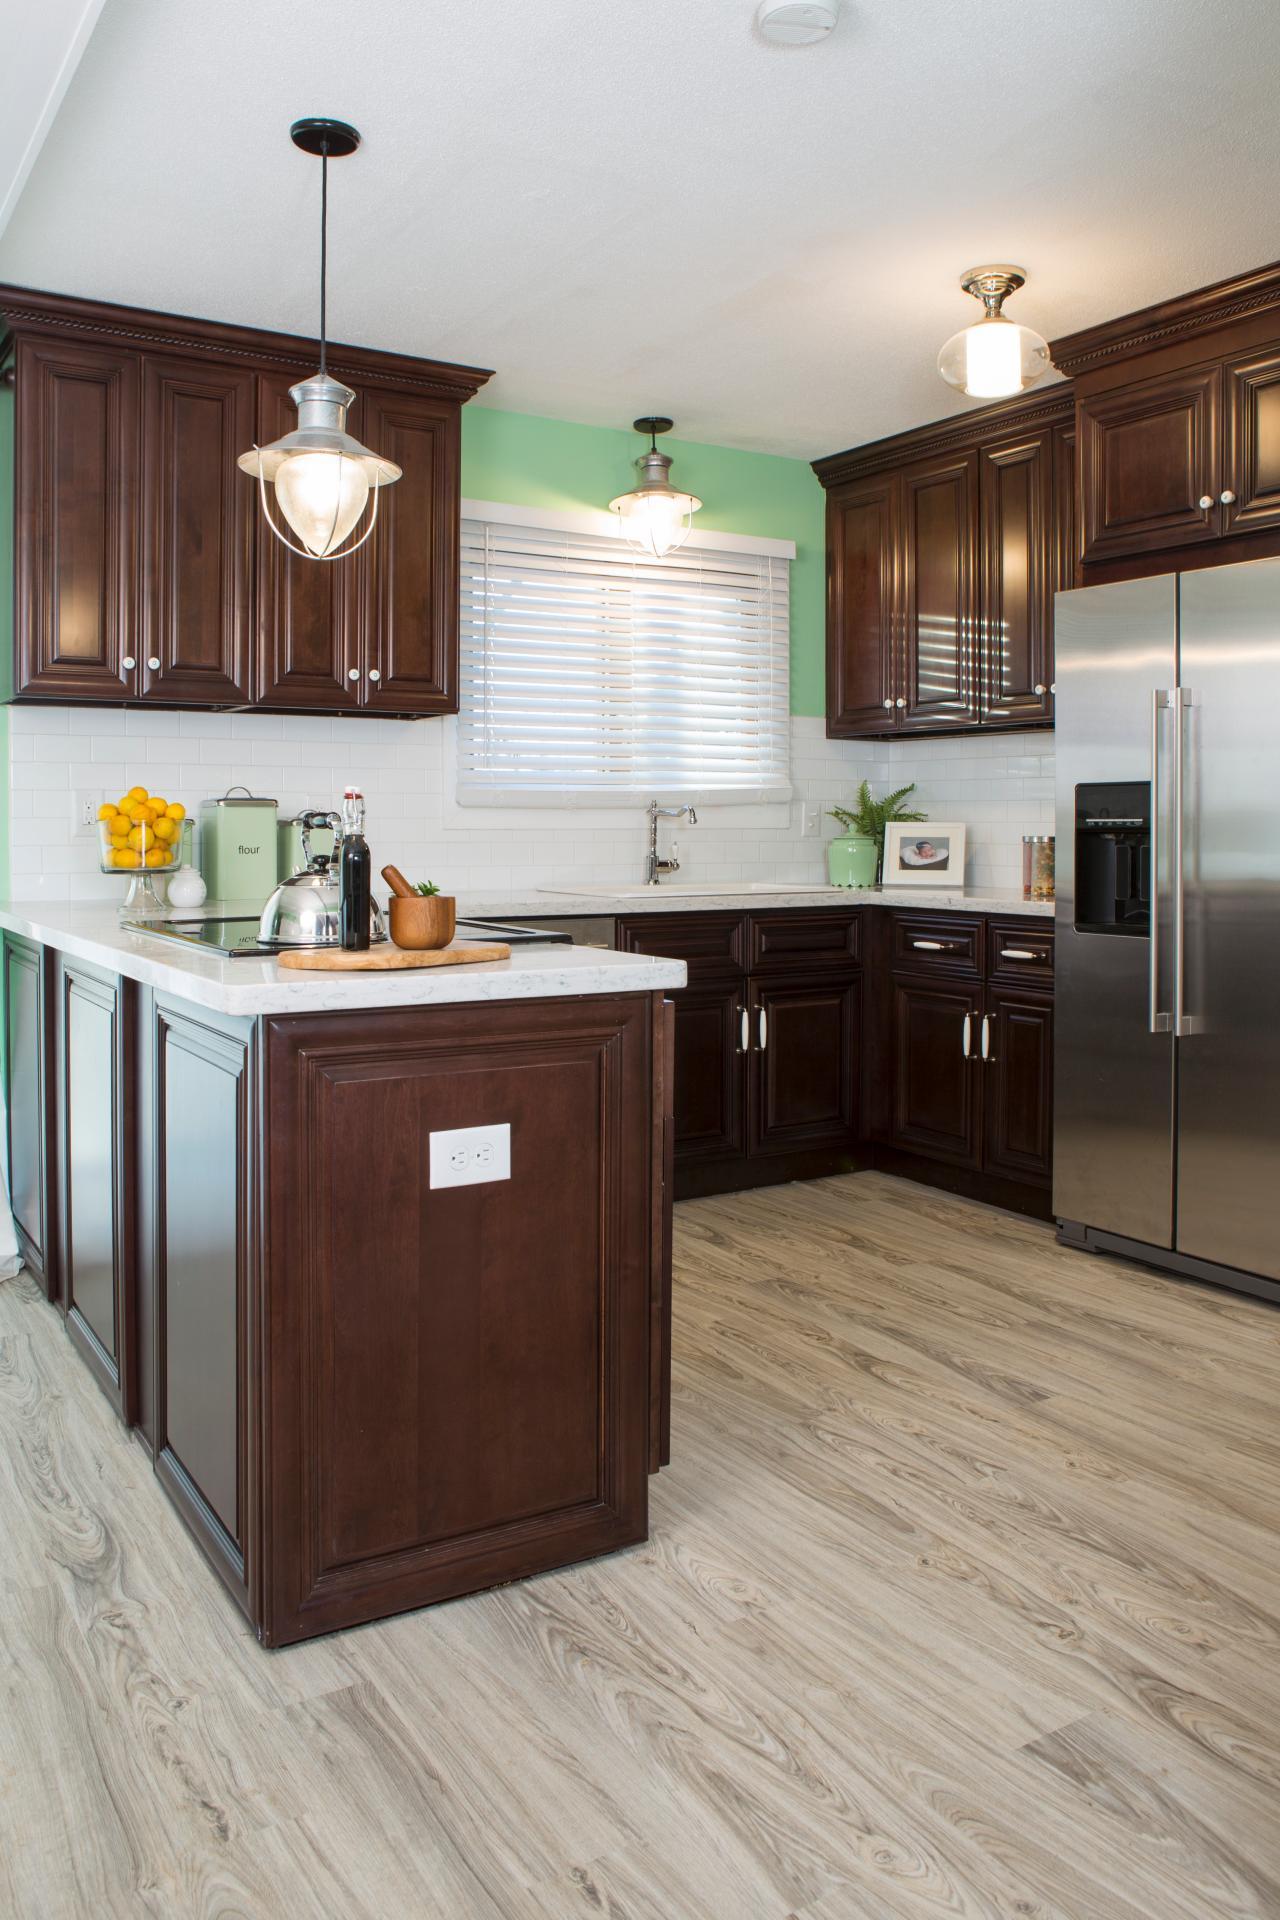 hraid105h_kitchen-09b-53429_s3x4-jpg-rend-hgtvcom-1280-1920